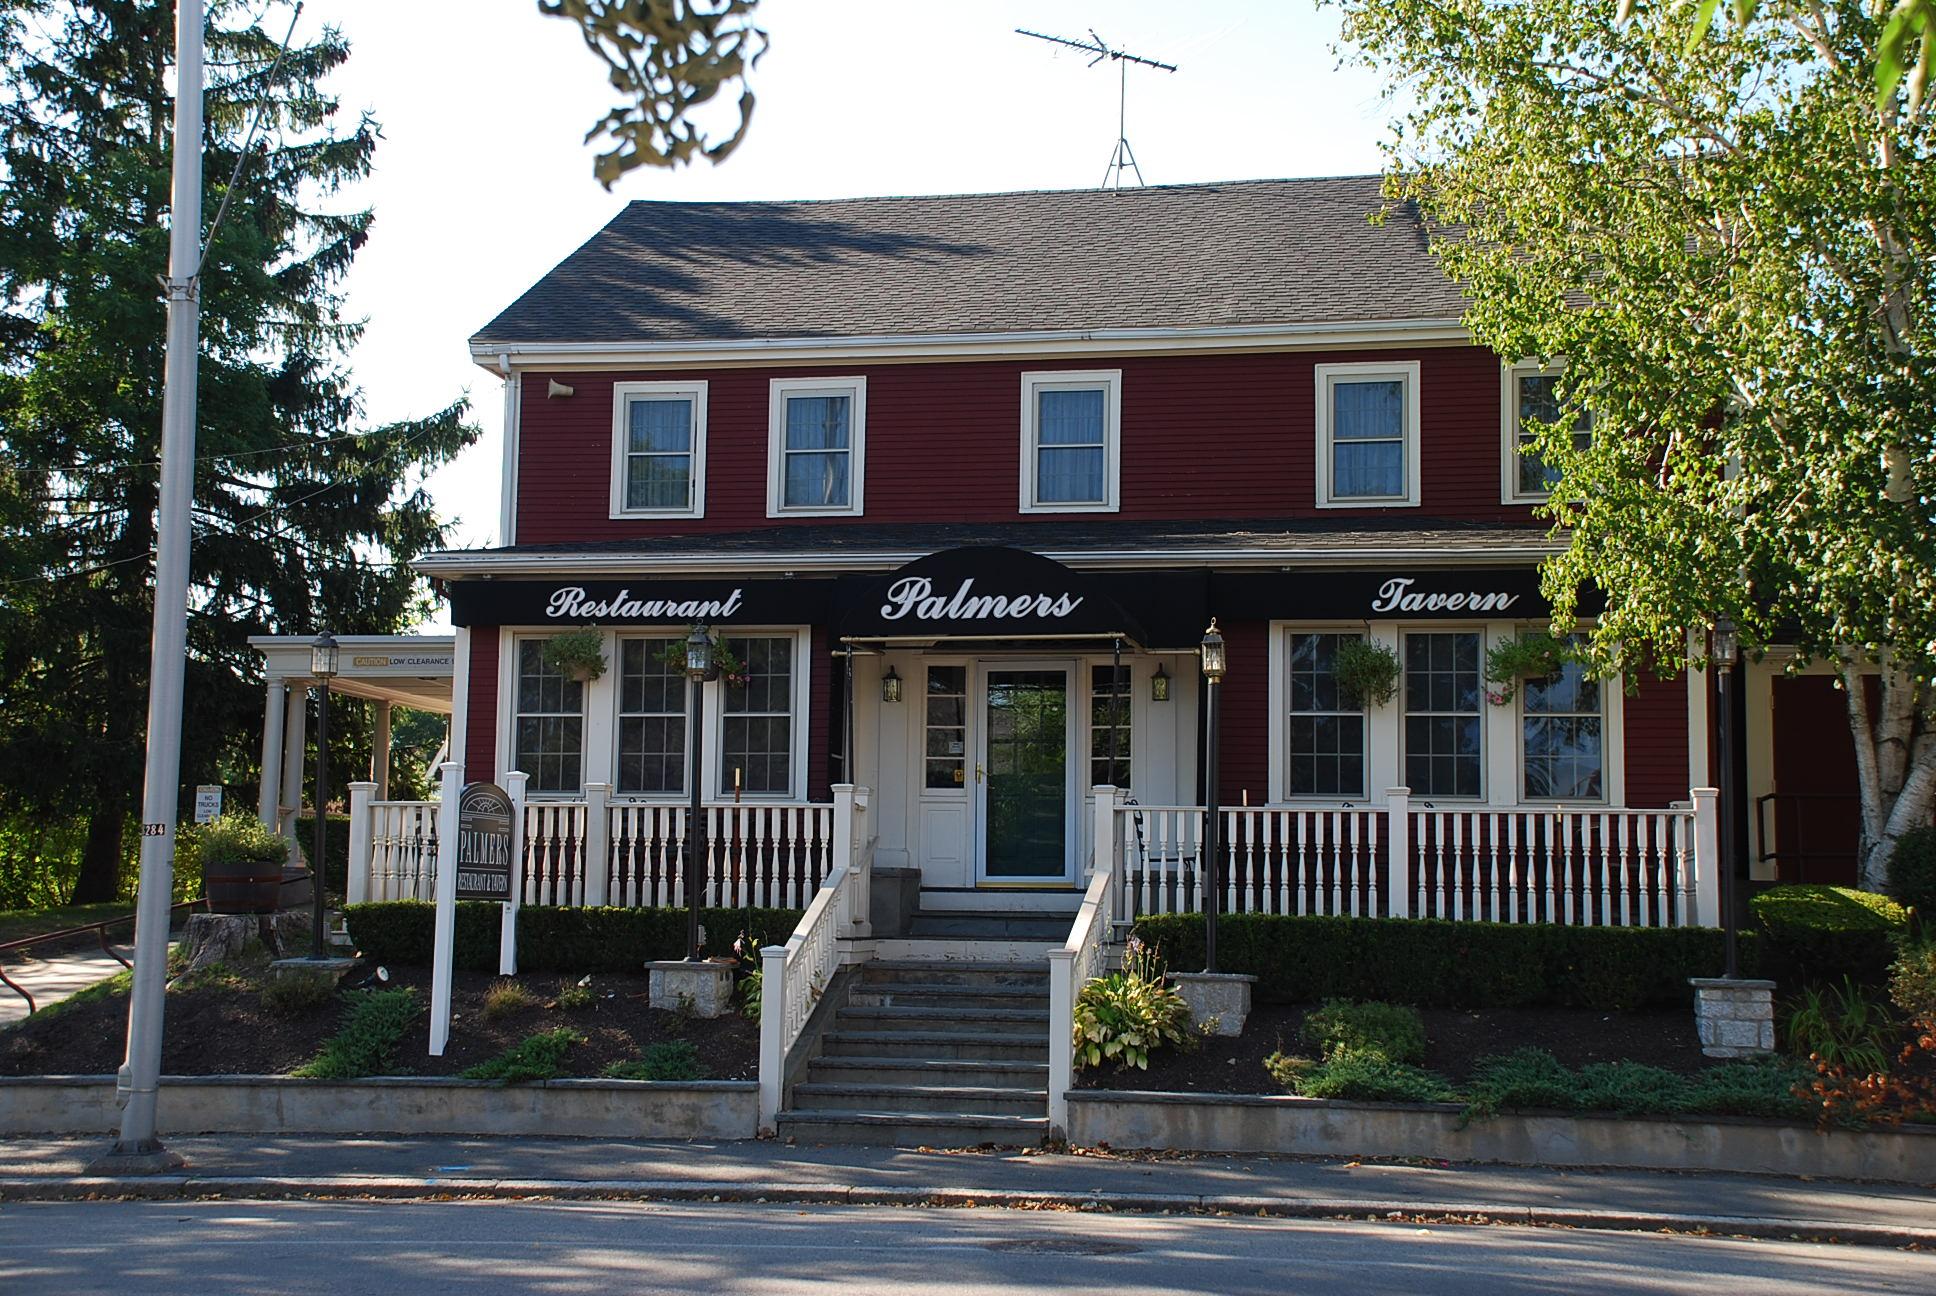 18 20 Elm Street Andover Historic